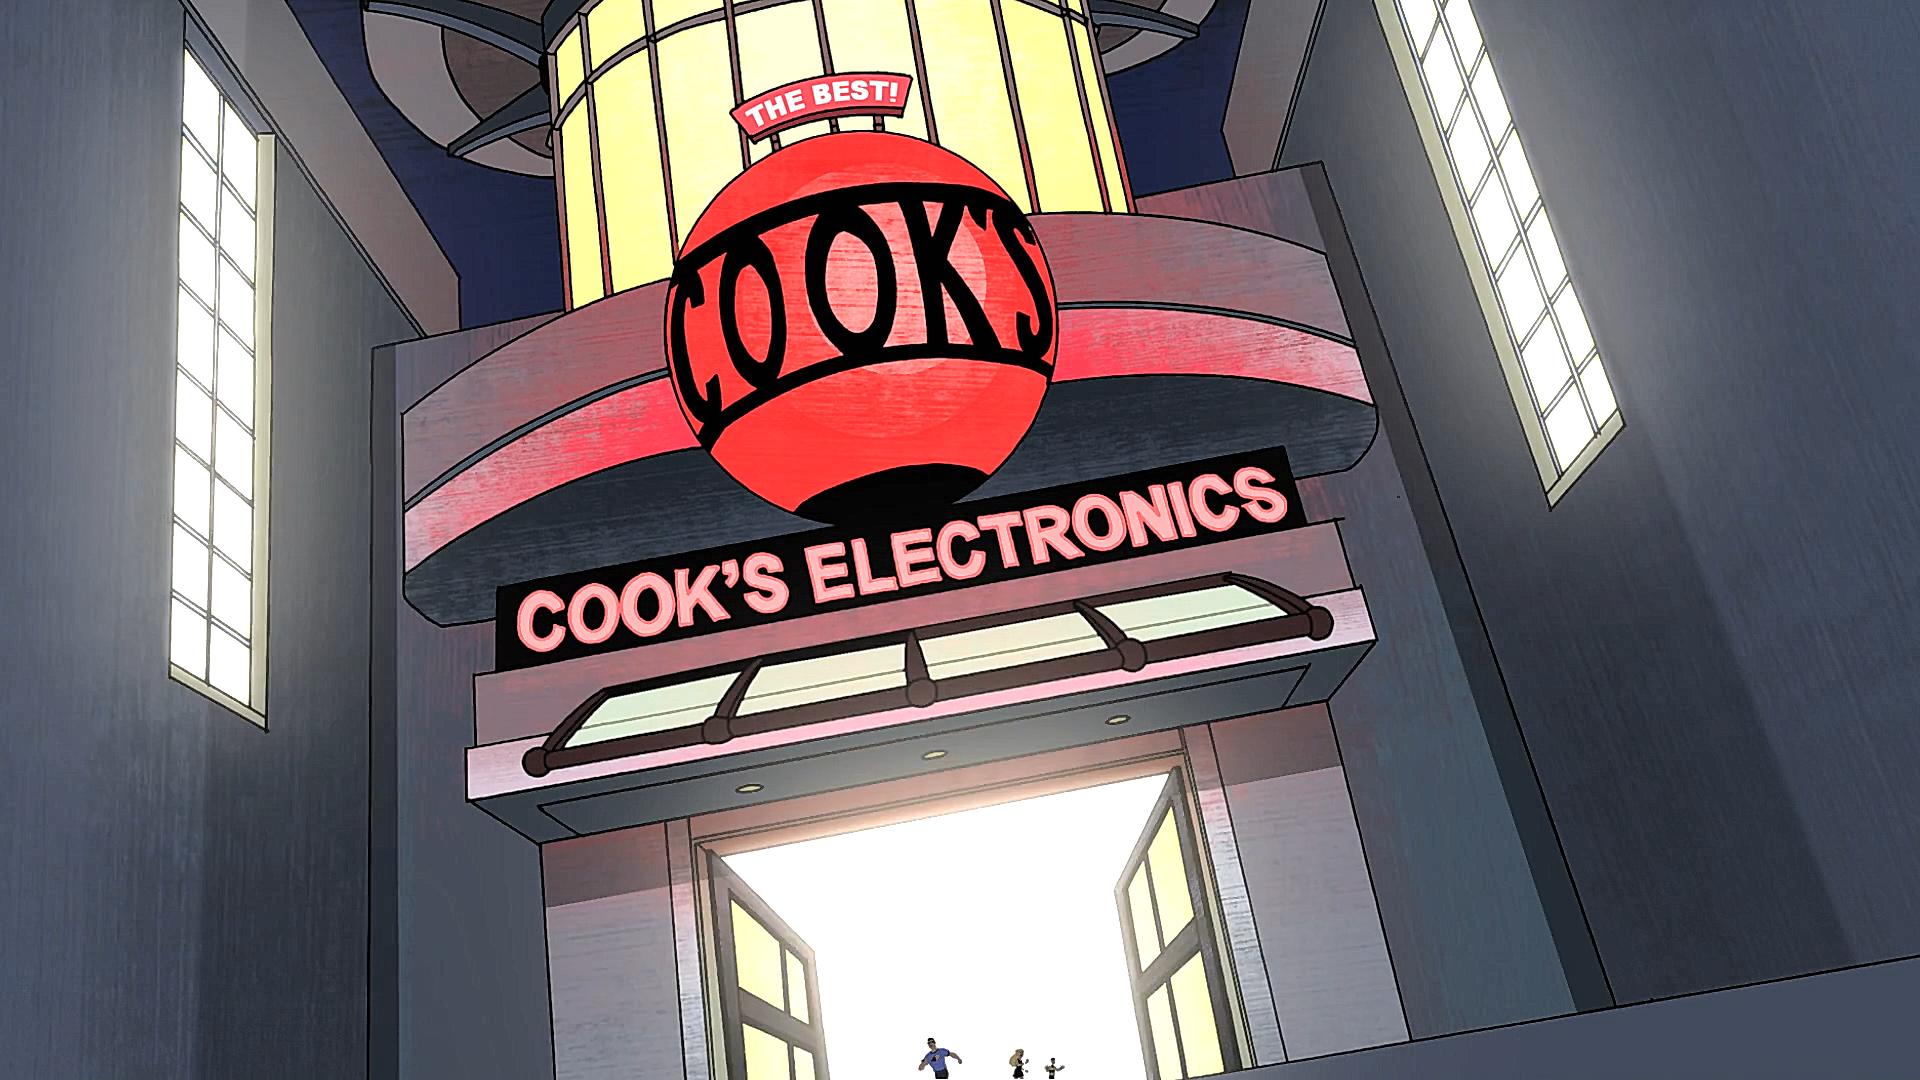 Cook's Electronics